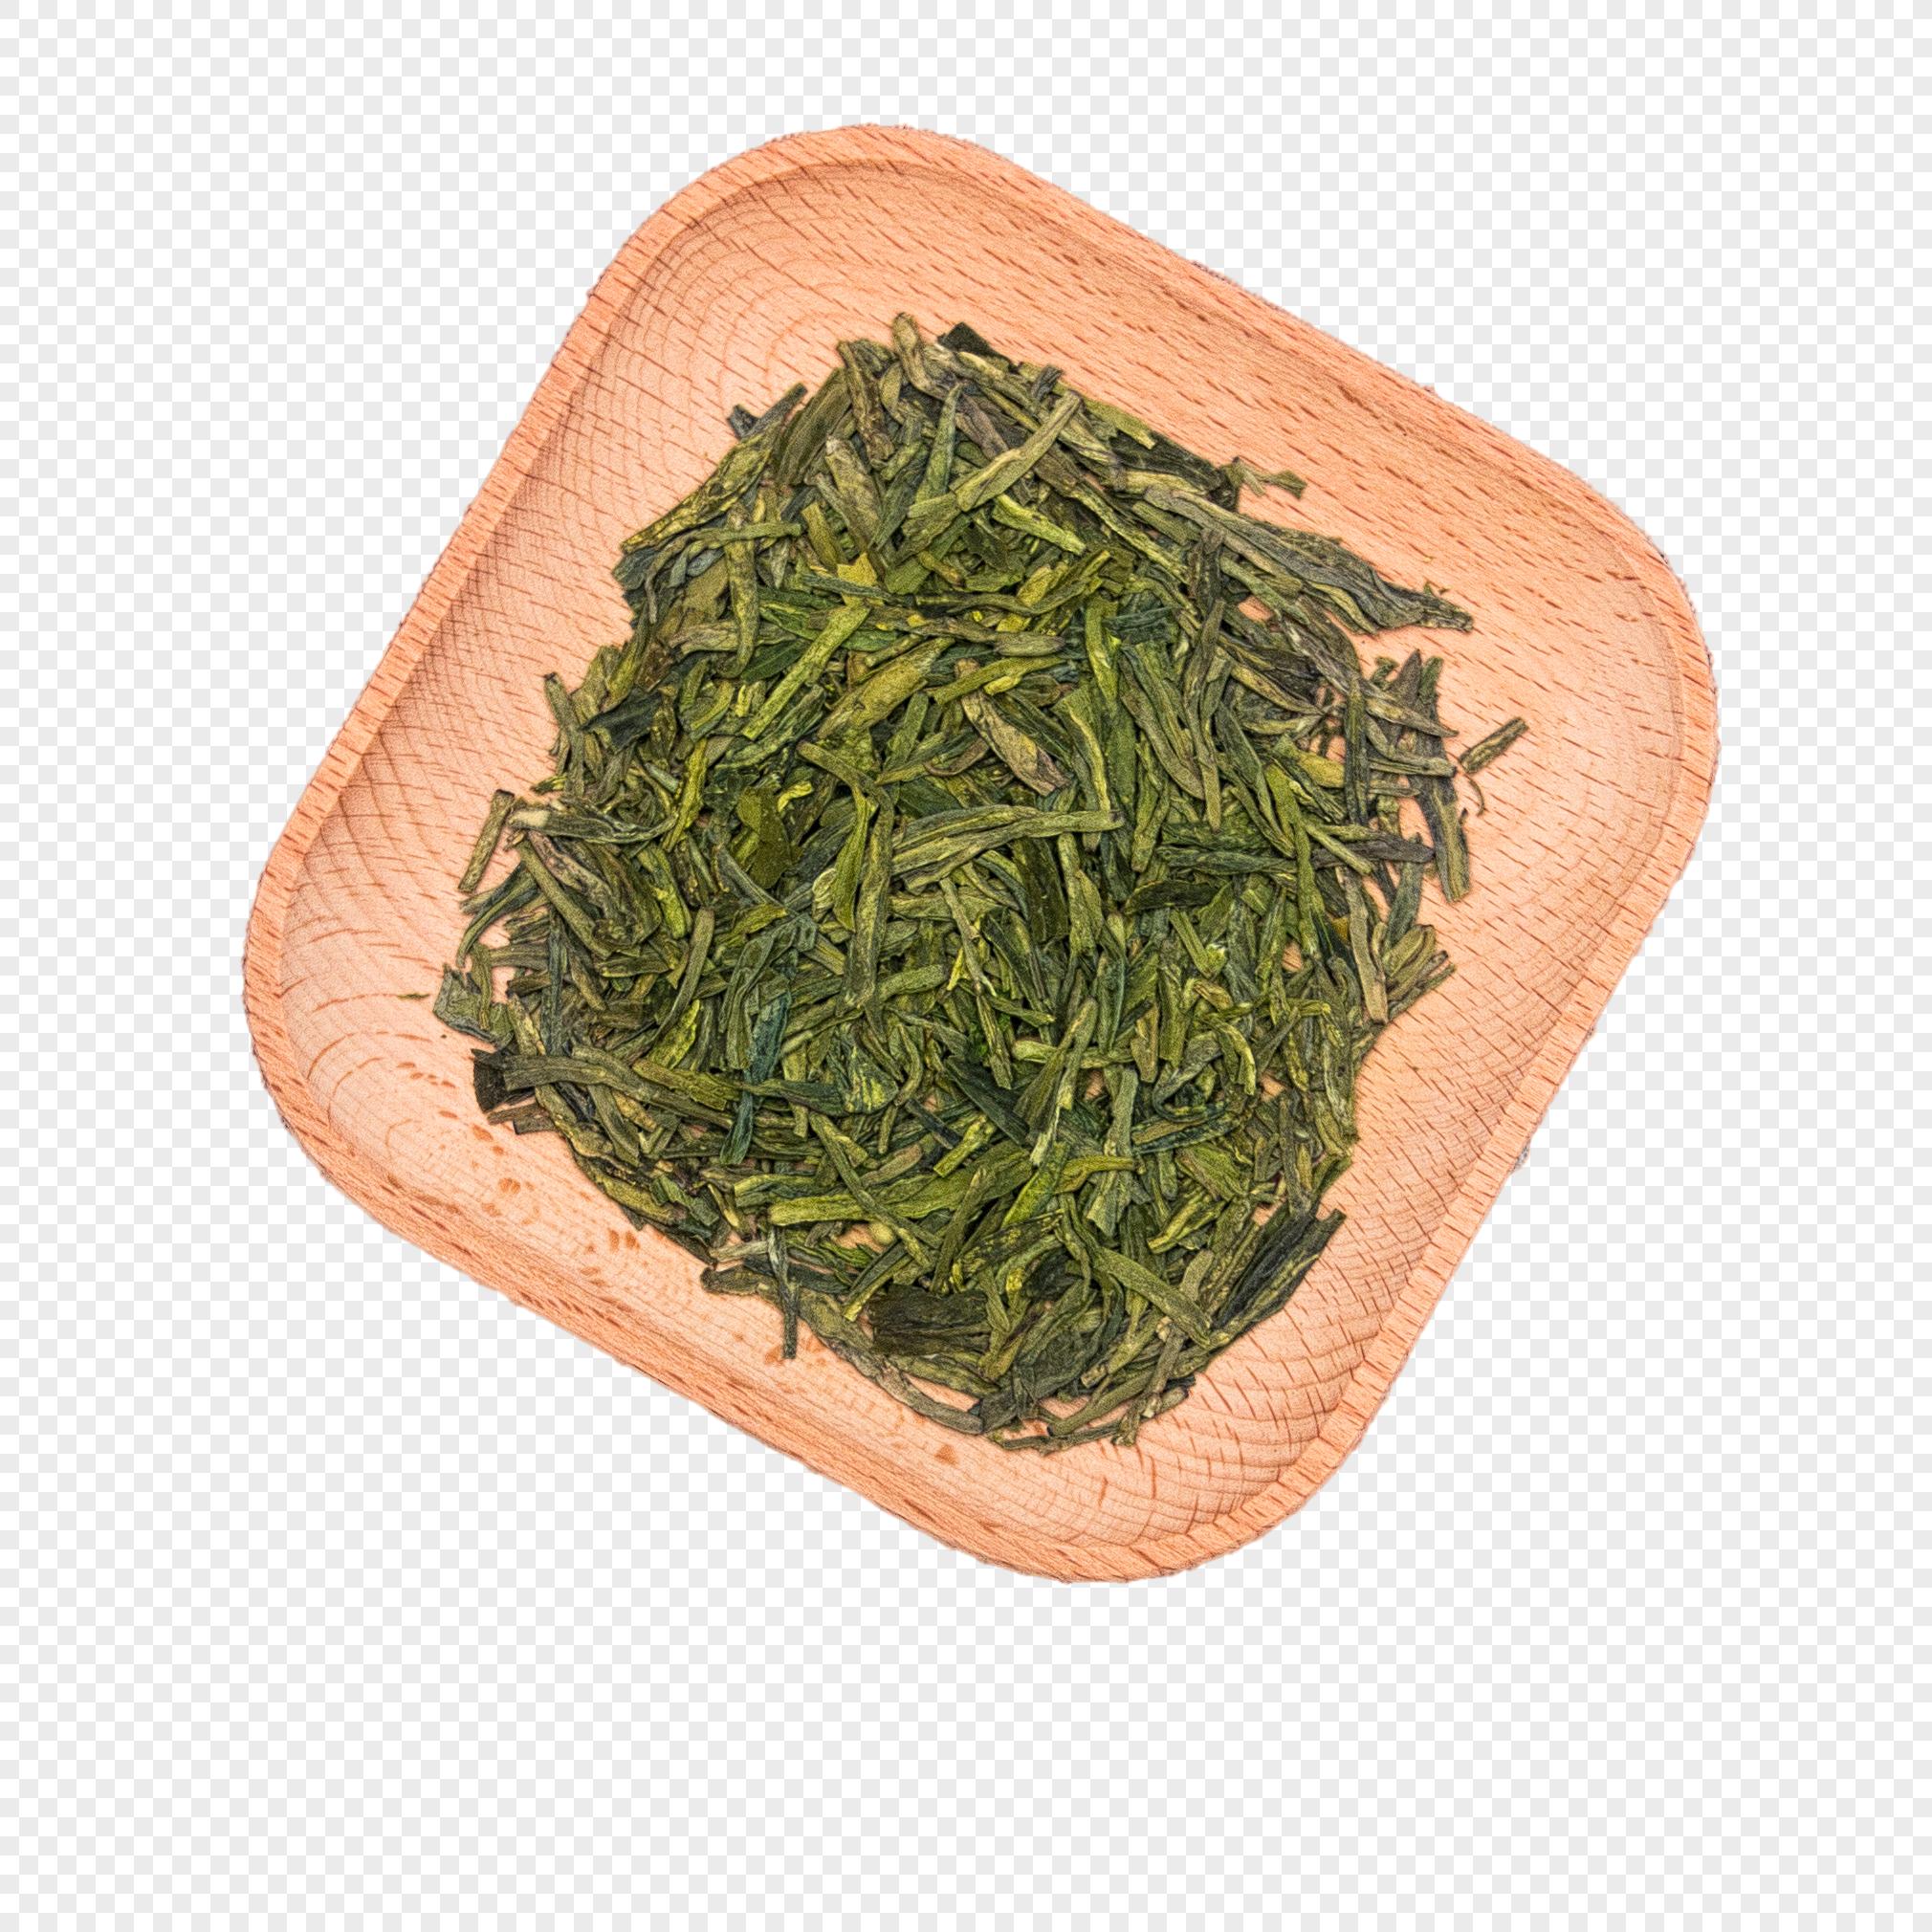 福鼎白茶产品介绍